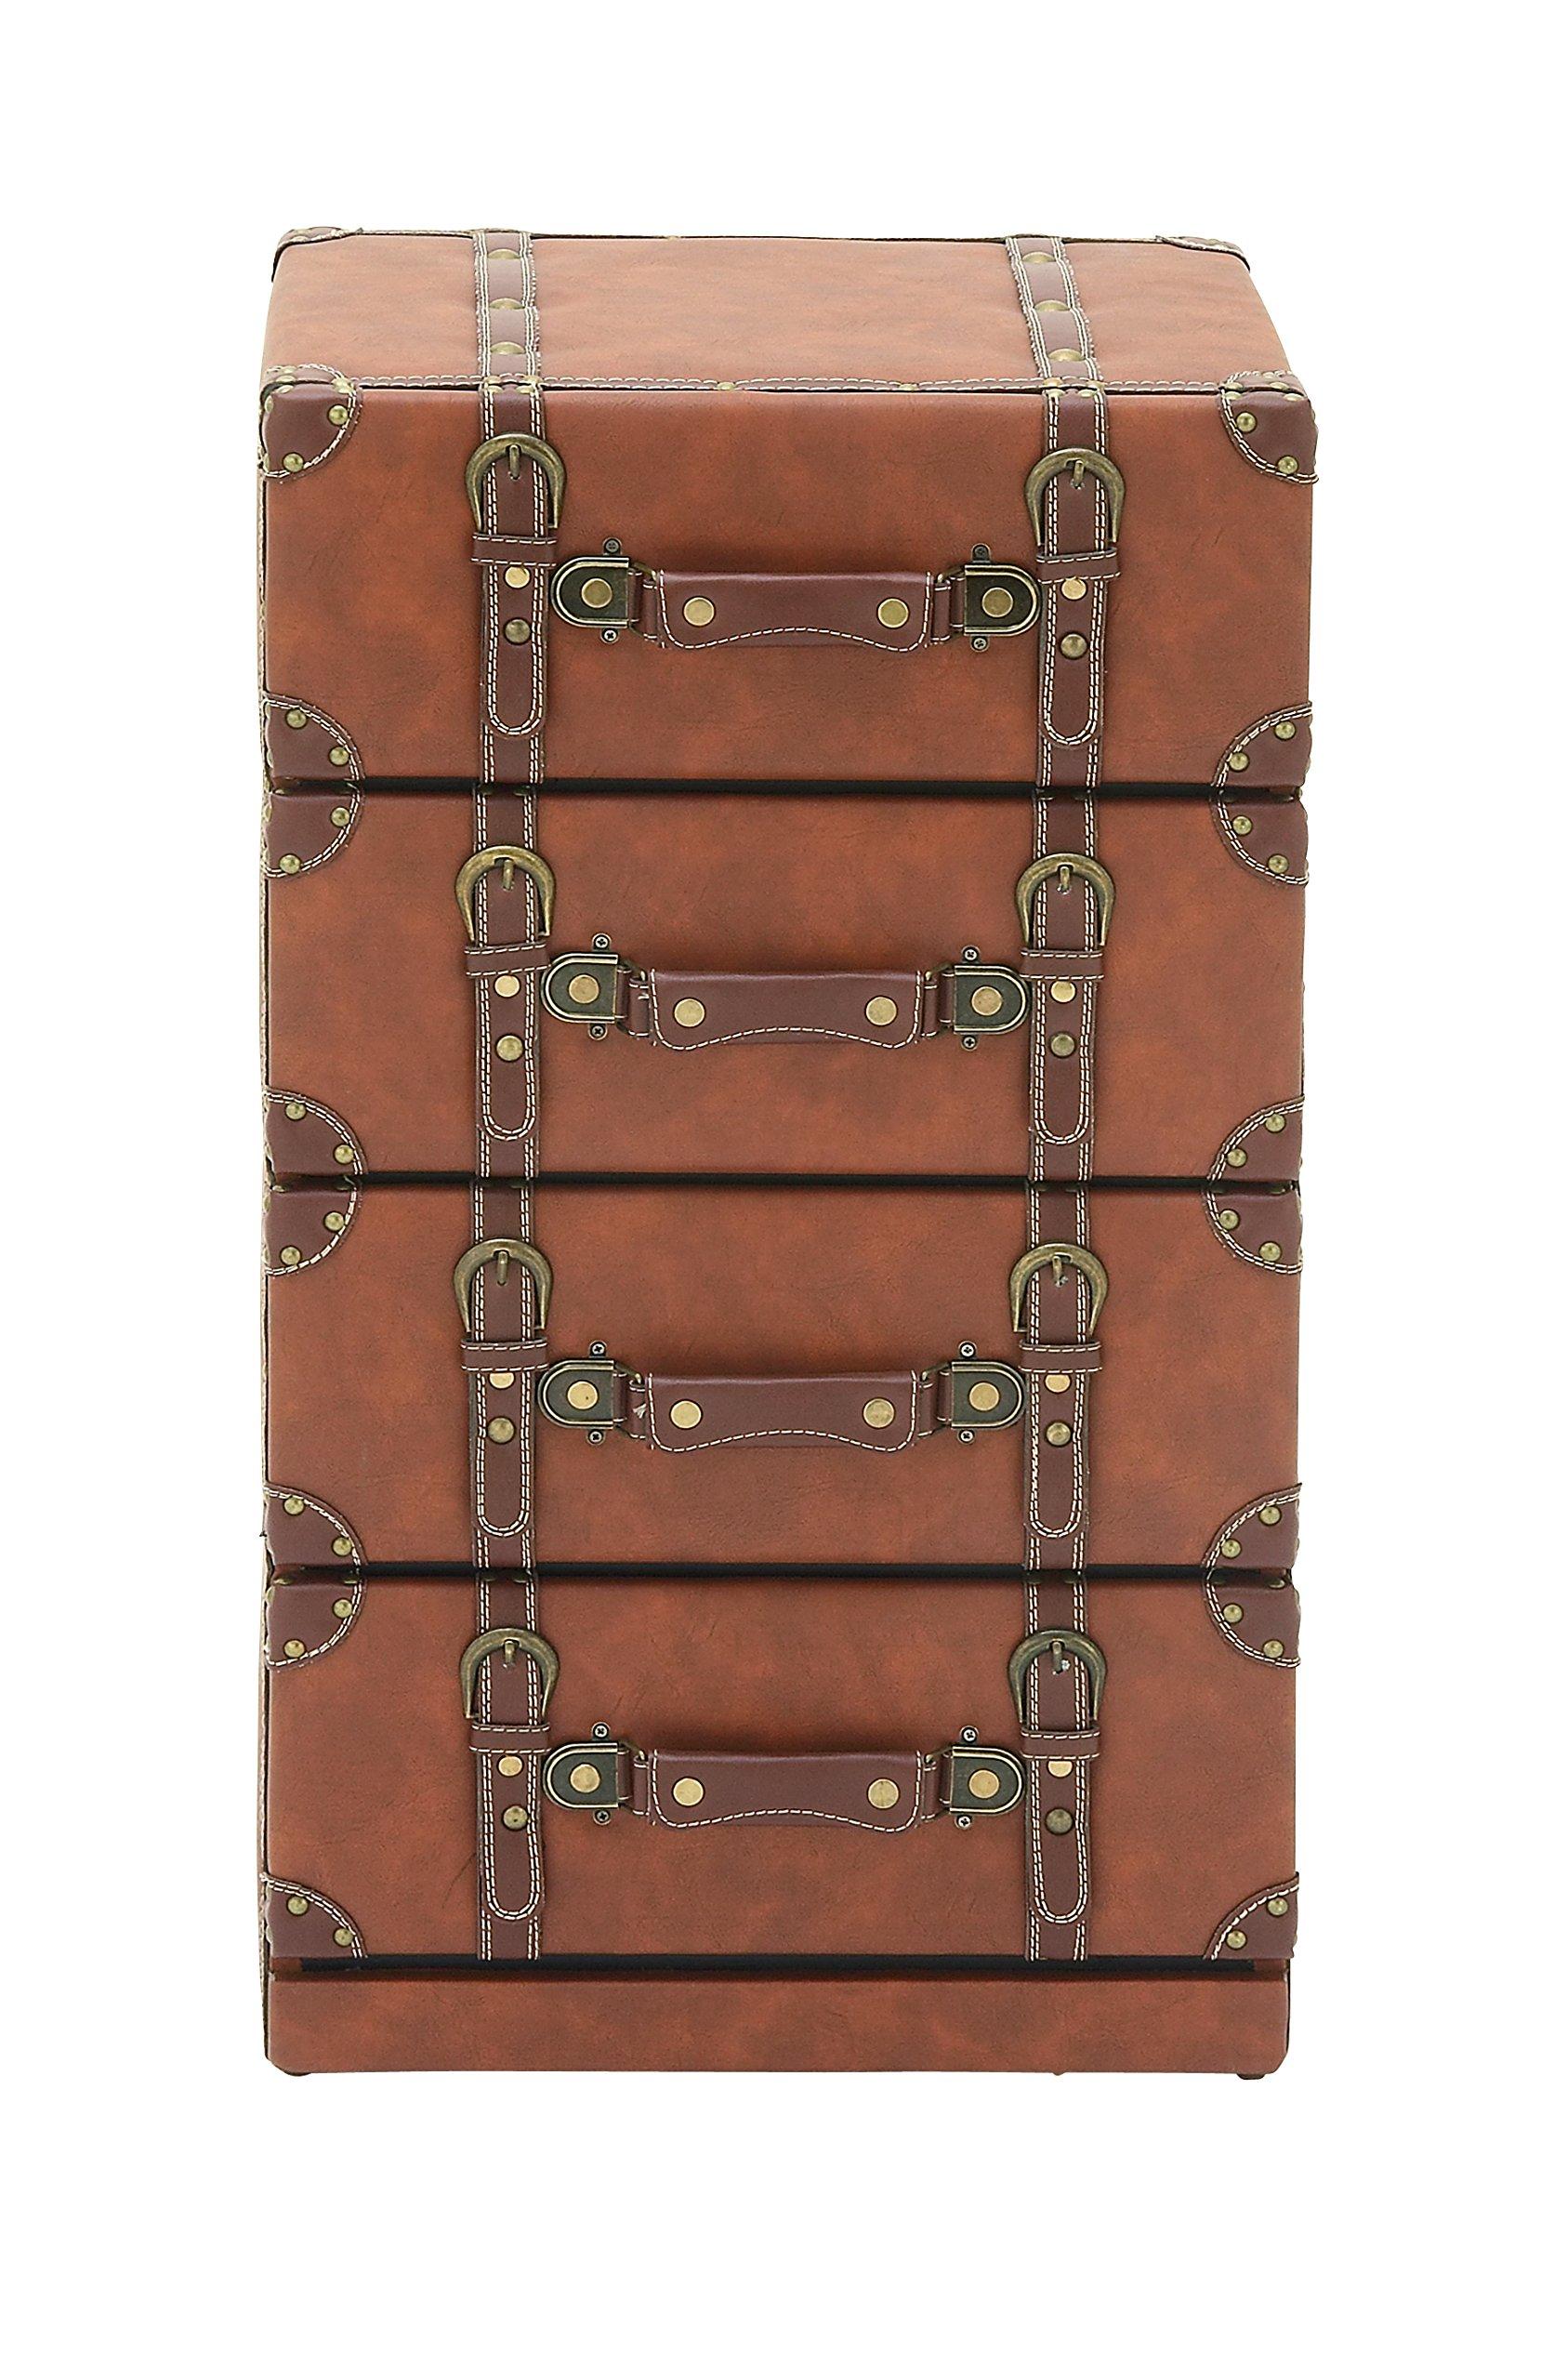 Deco 79 55772 Wood Leather 4 Drawer Dresser, 16''W/28''H